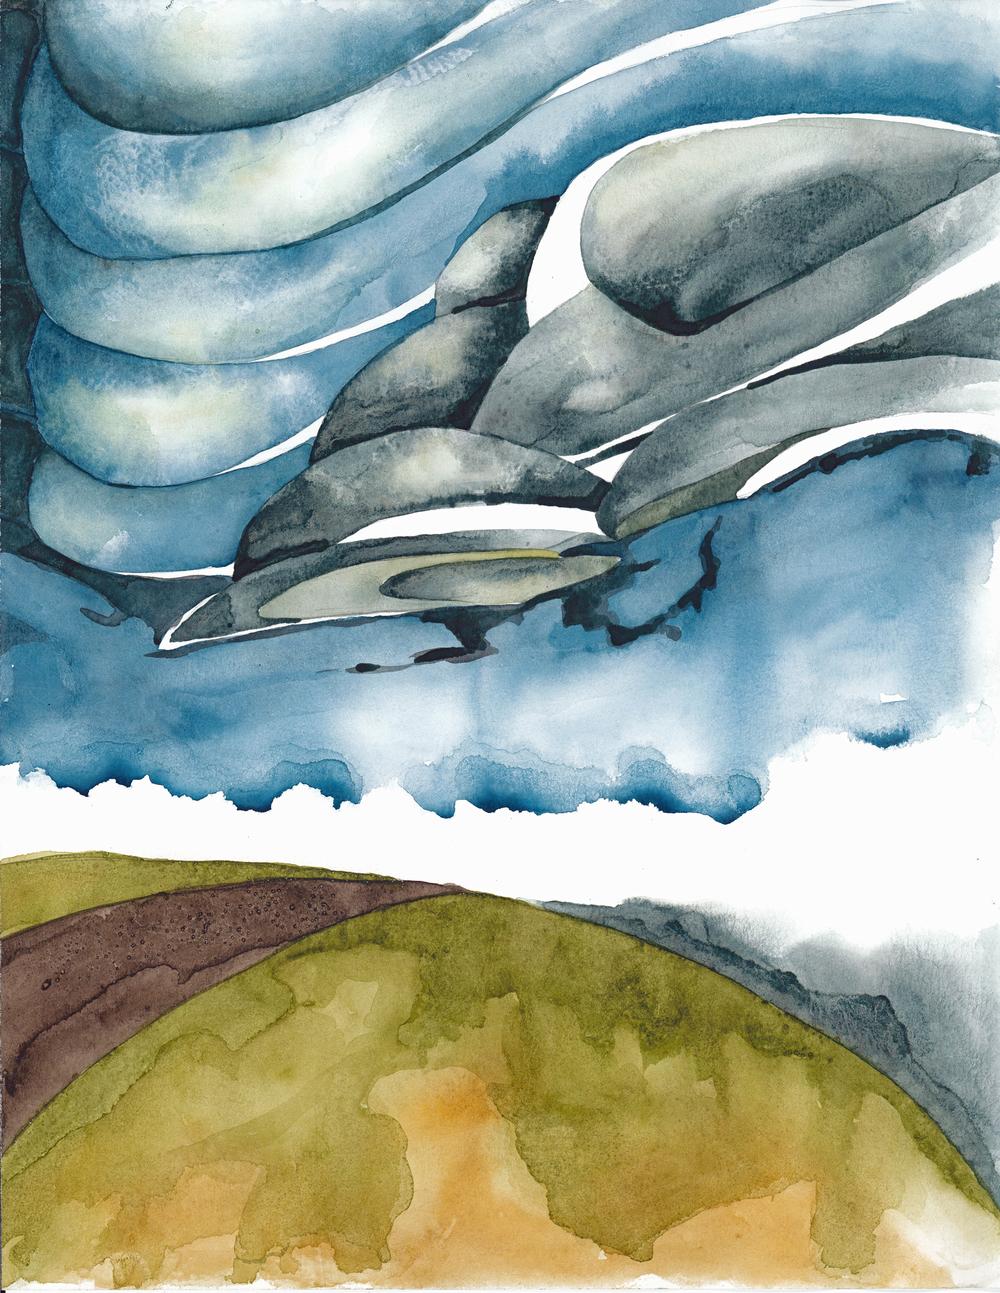 B 79 - Zendustria                         Jason Williams Watercolor abstract interpretations of nature